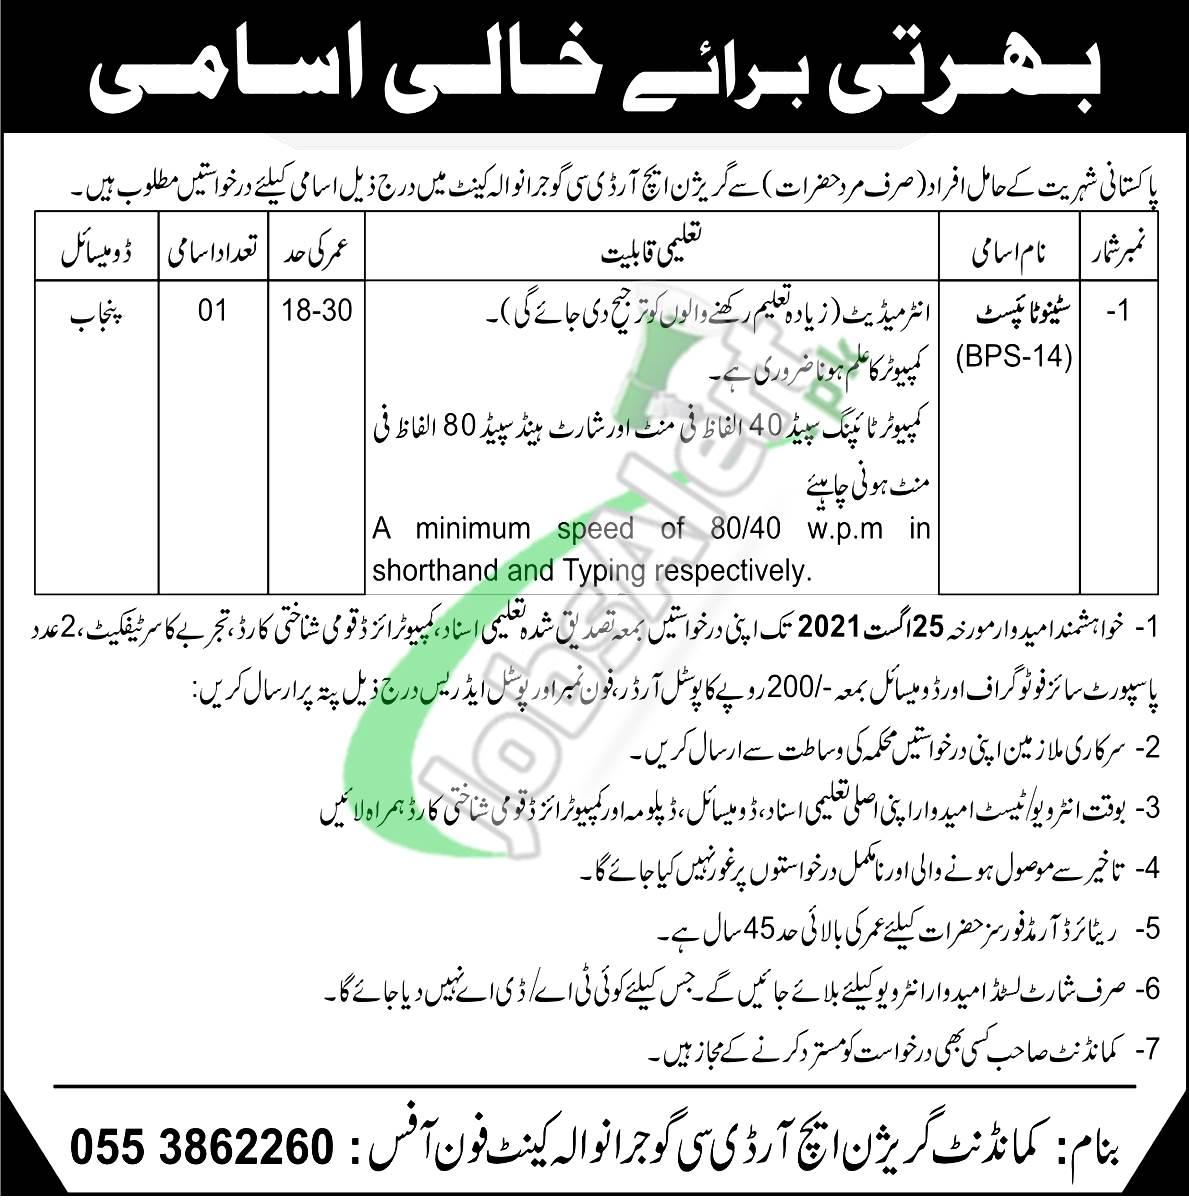 Garrison Human Resource Development Center Gujranwala Jobs